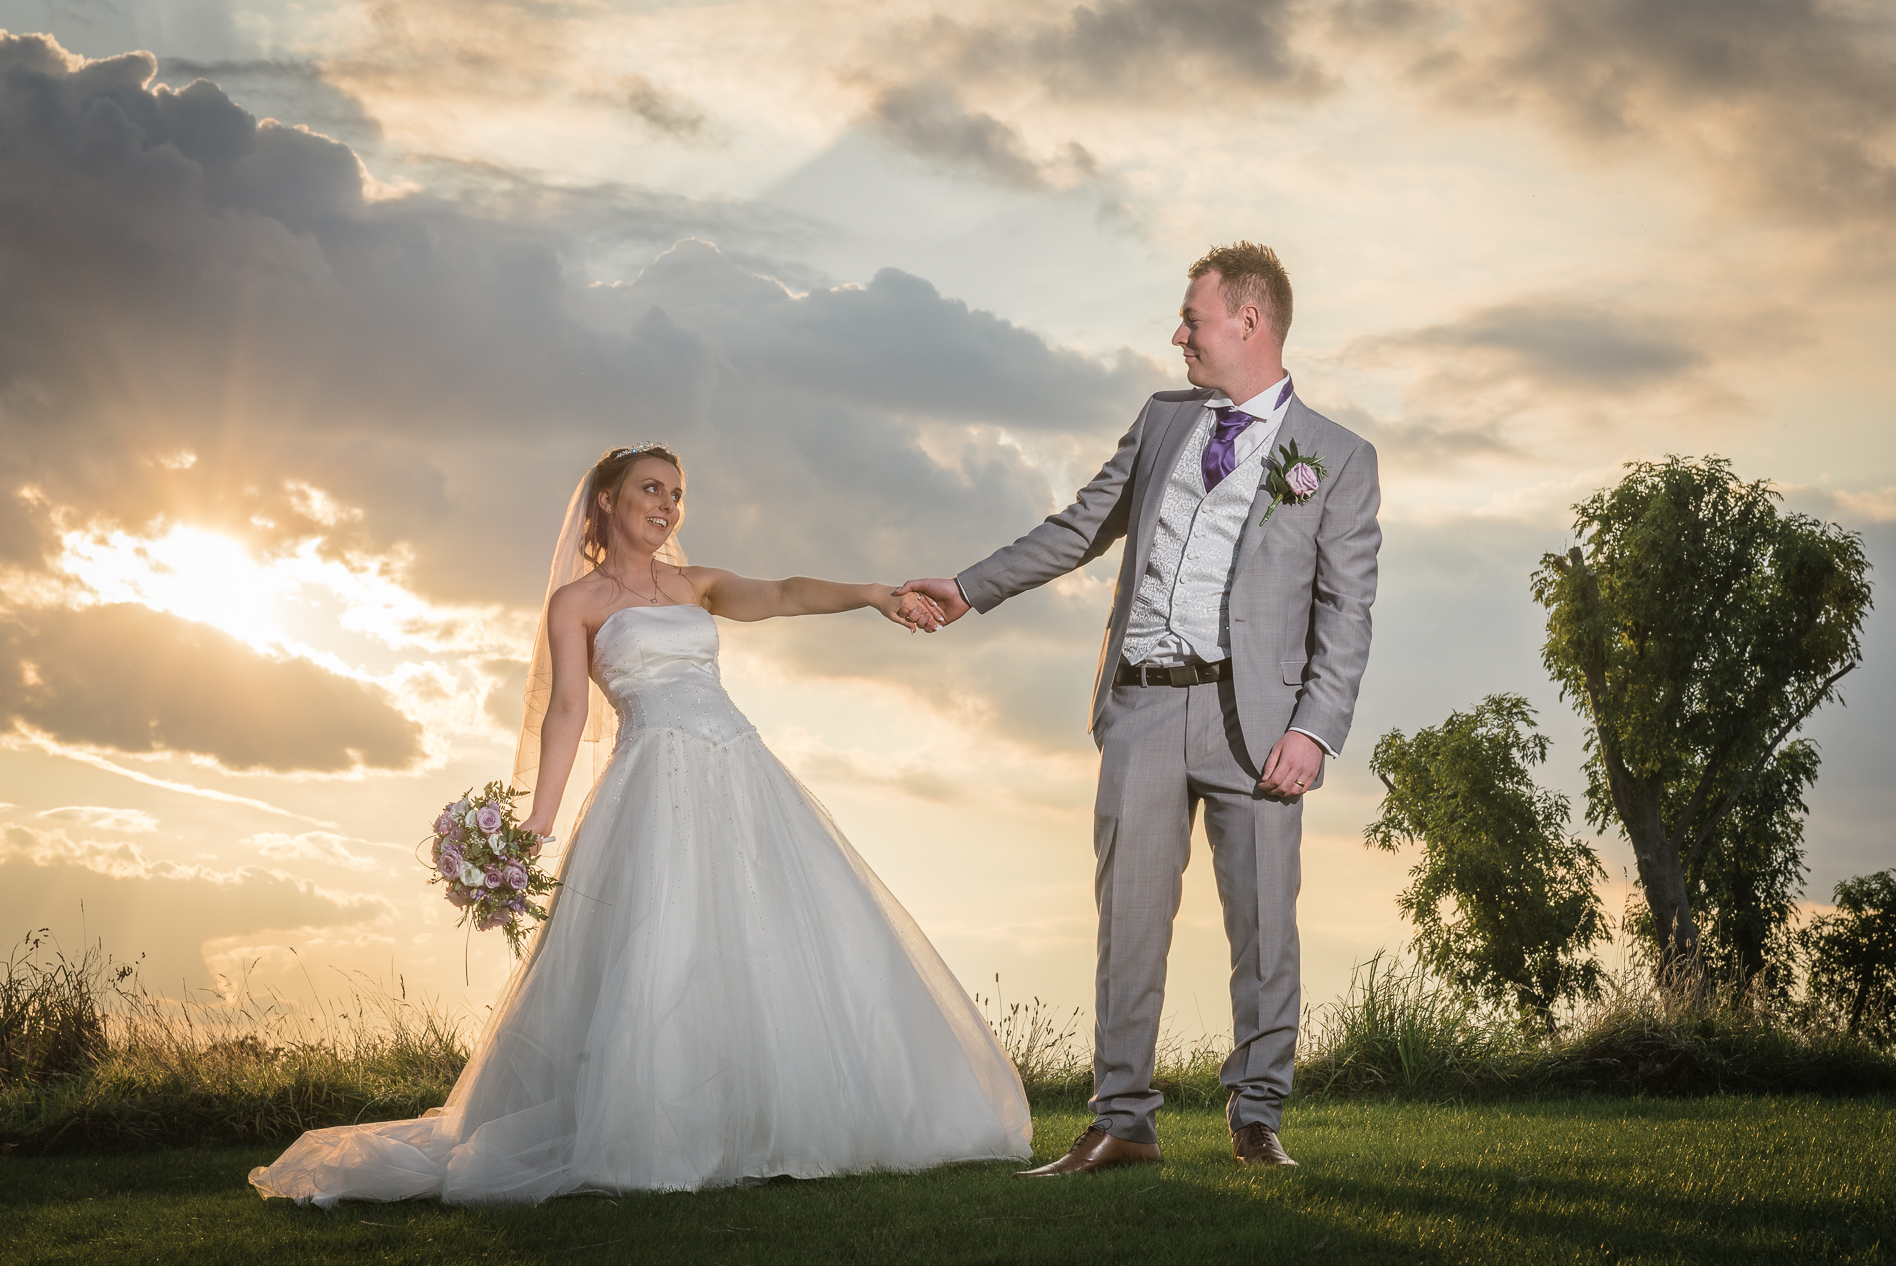 Danson House Bexley Wedding of Jane and Daniel